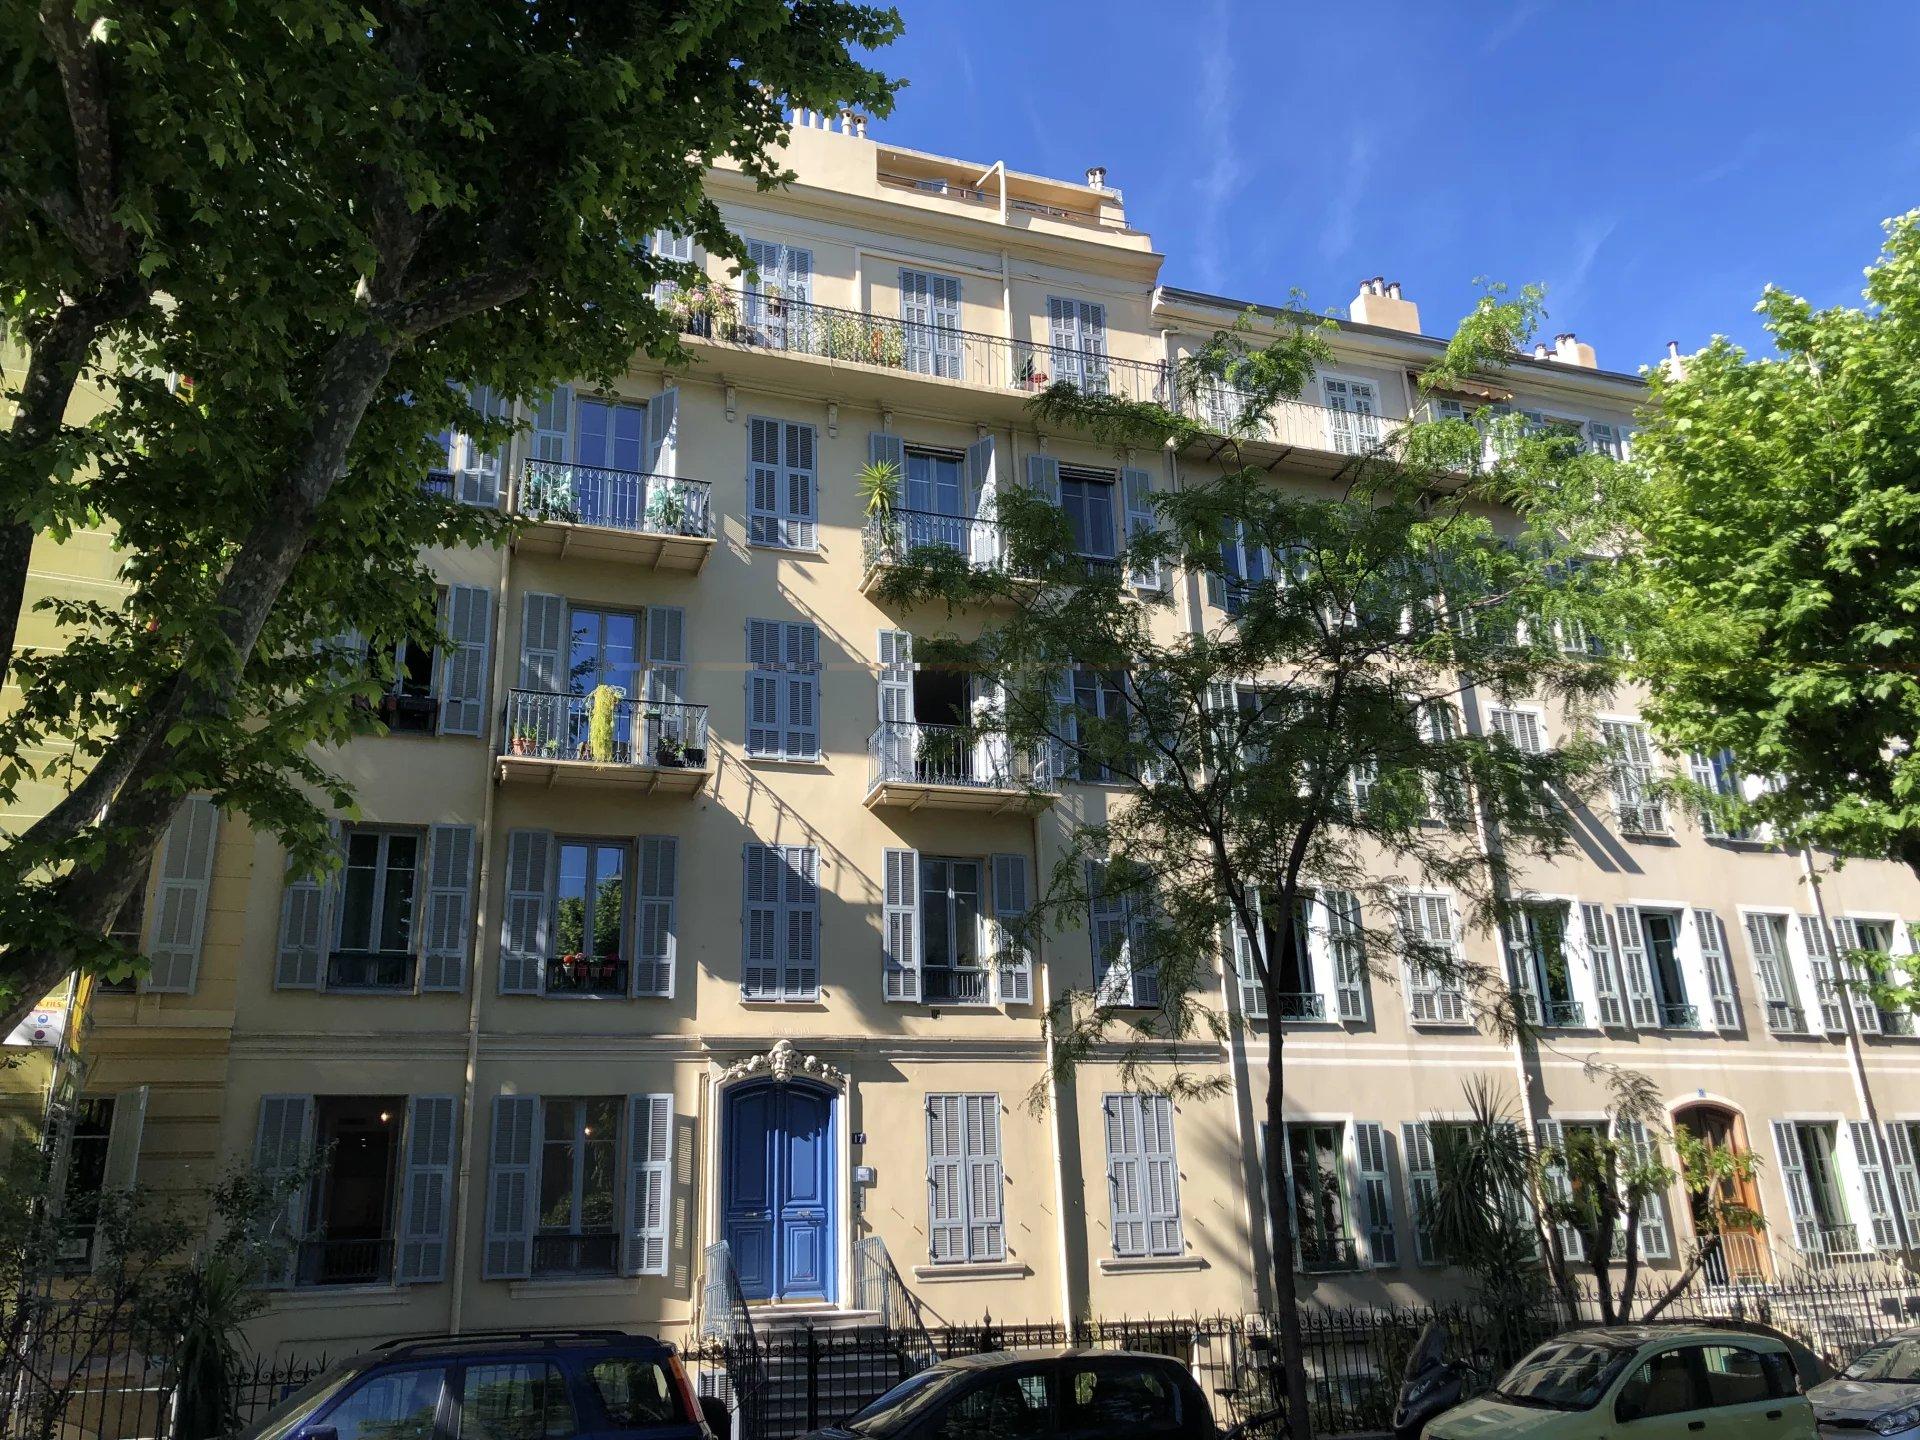 Affitto Appartamento - Nizza (Nice) Carabacel